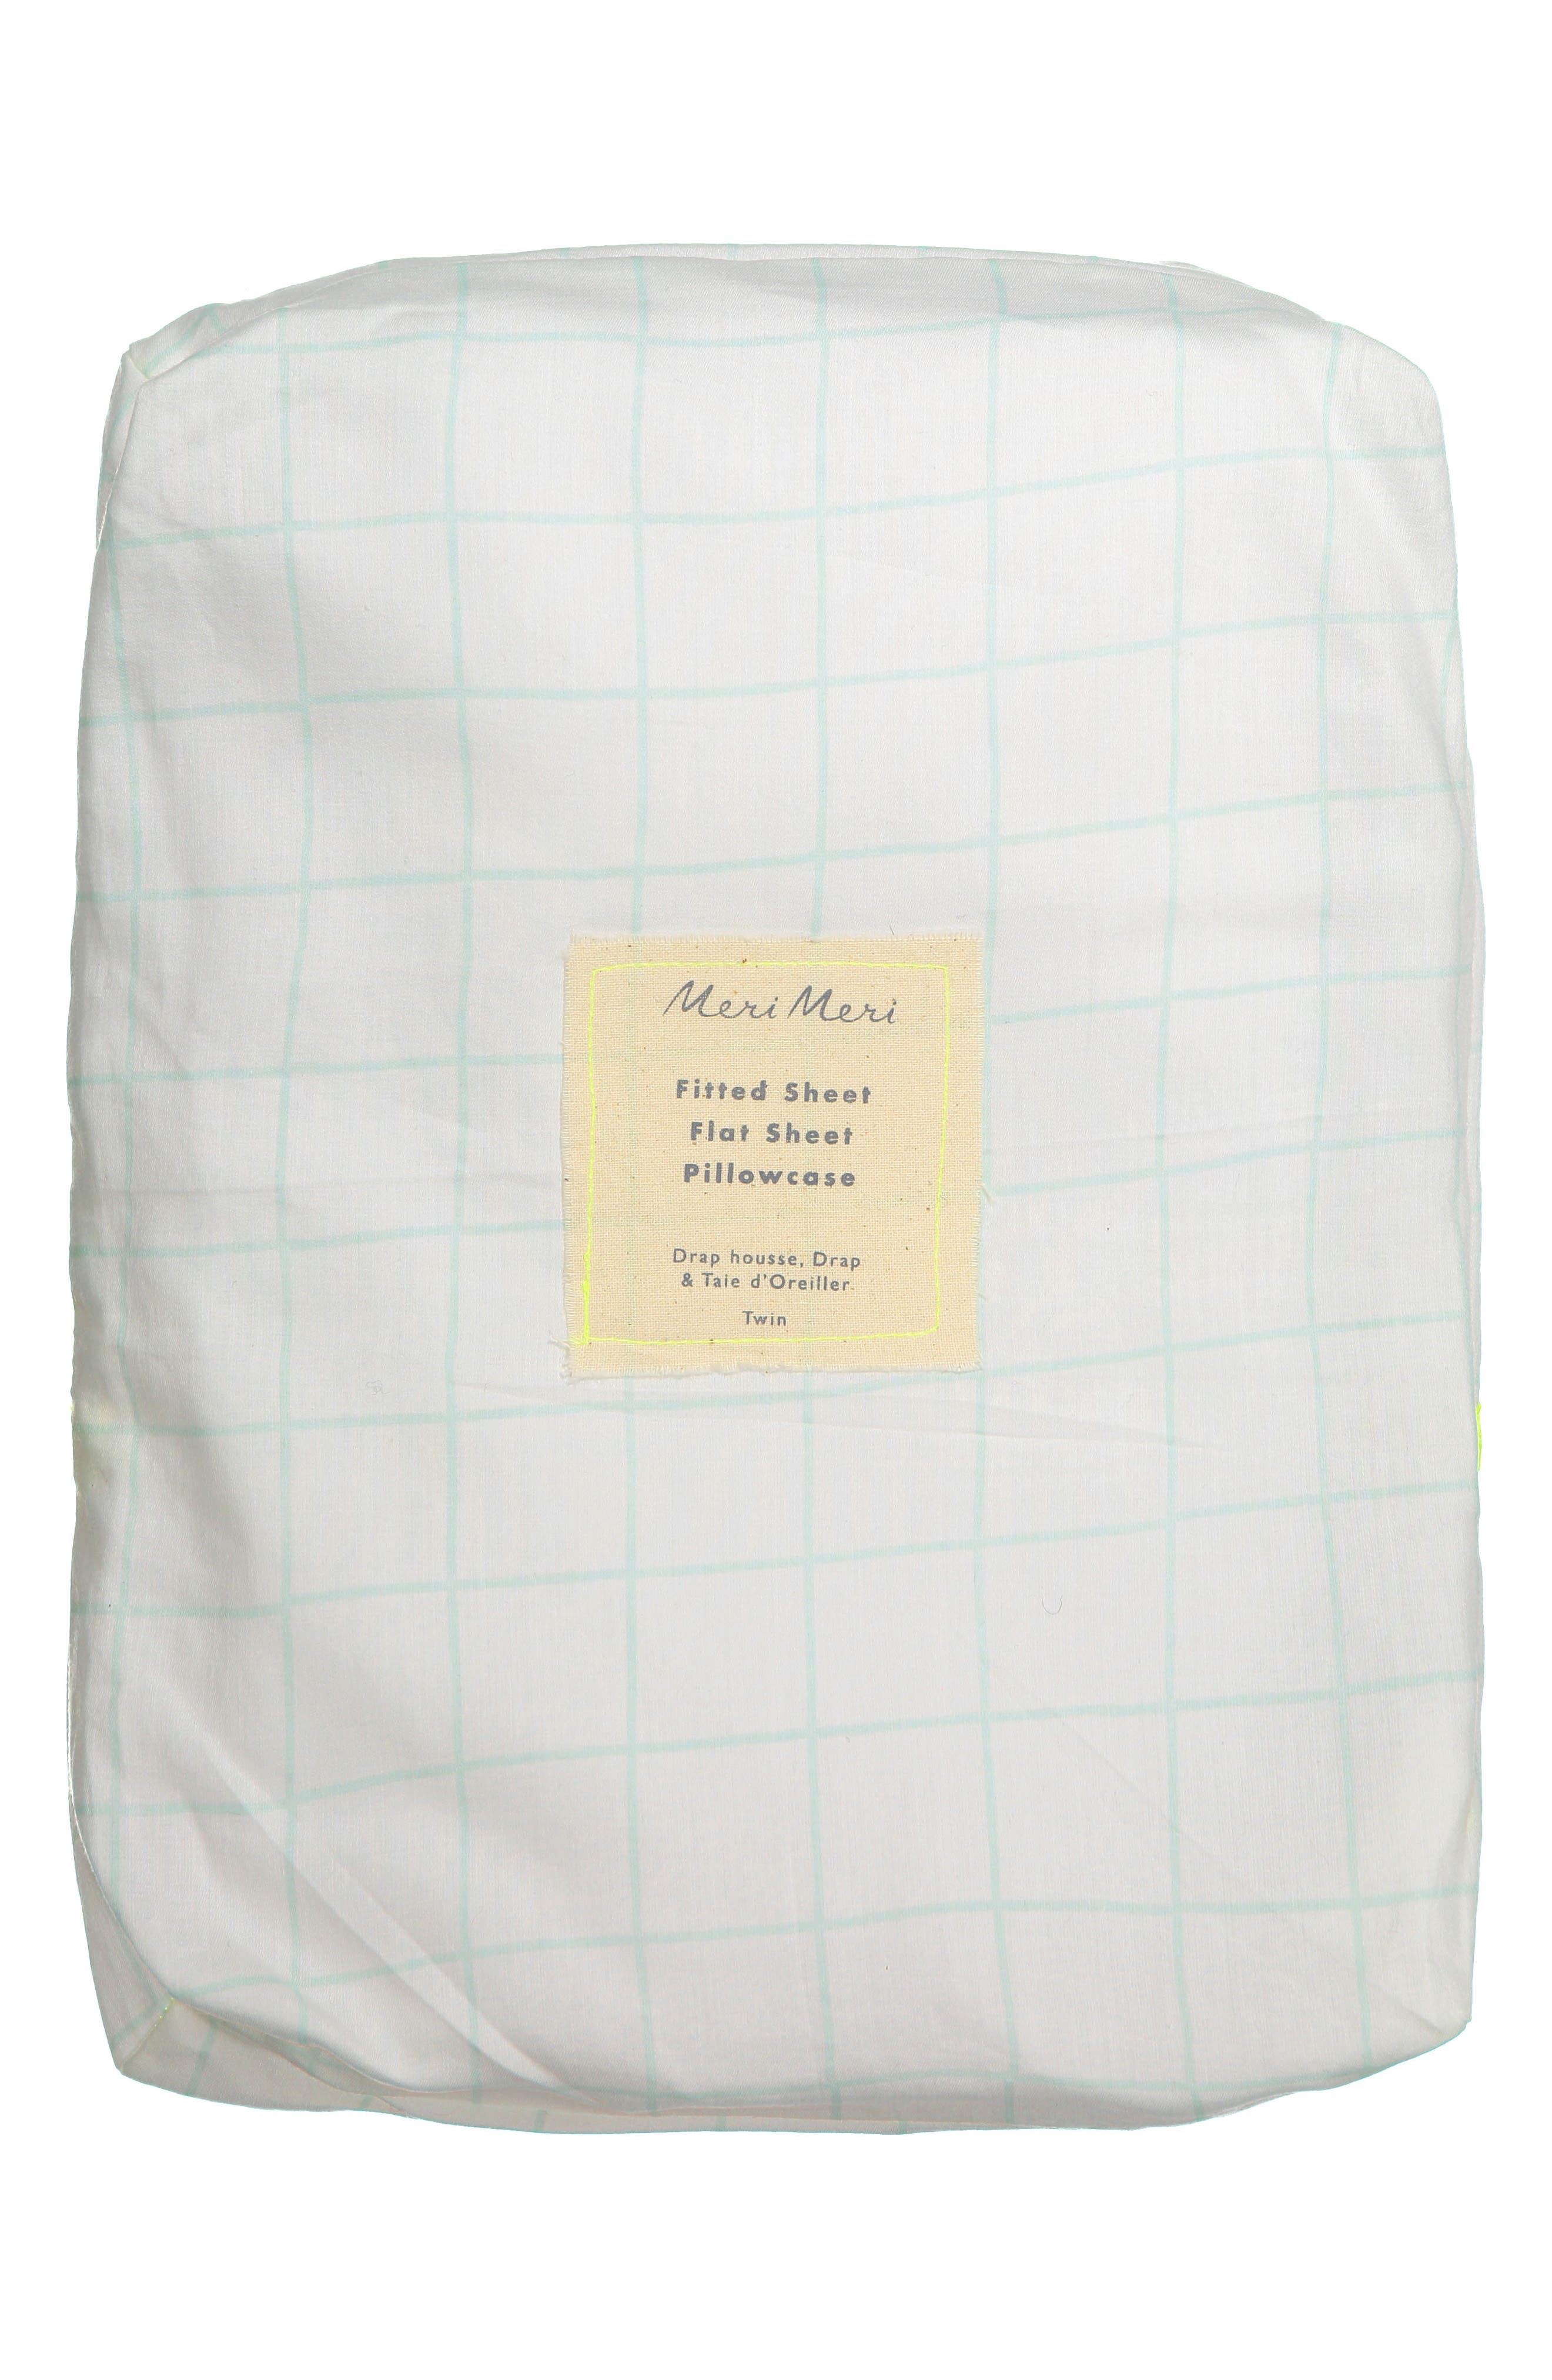 Twin Sheet & Pillowcase Set,                         Main,                         color, MINT